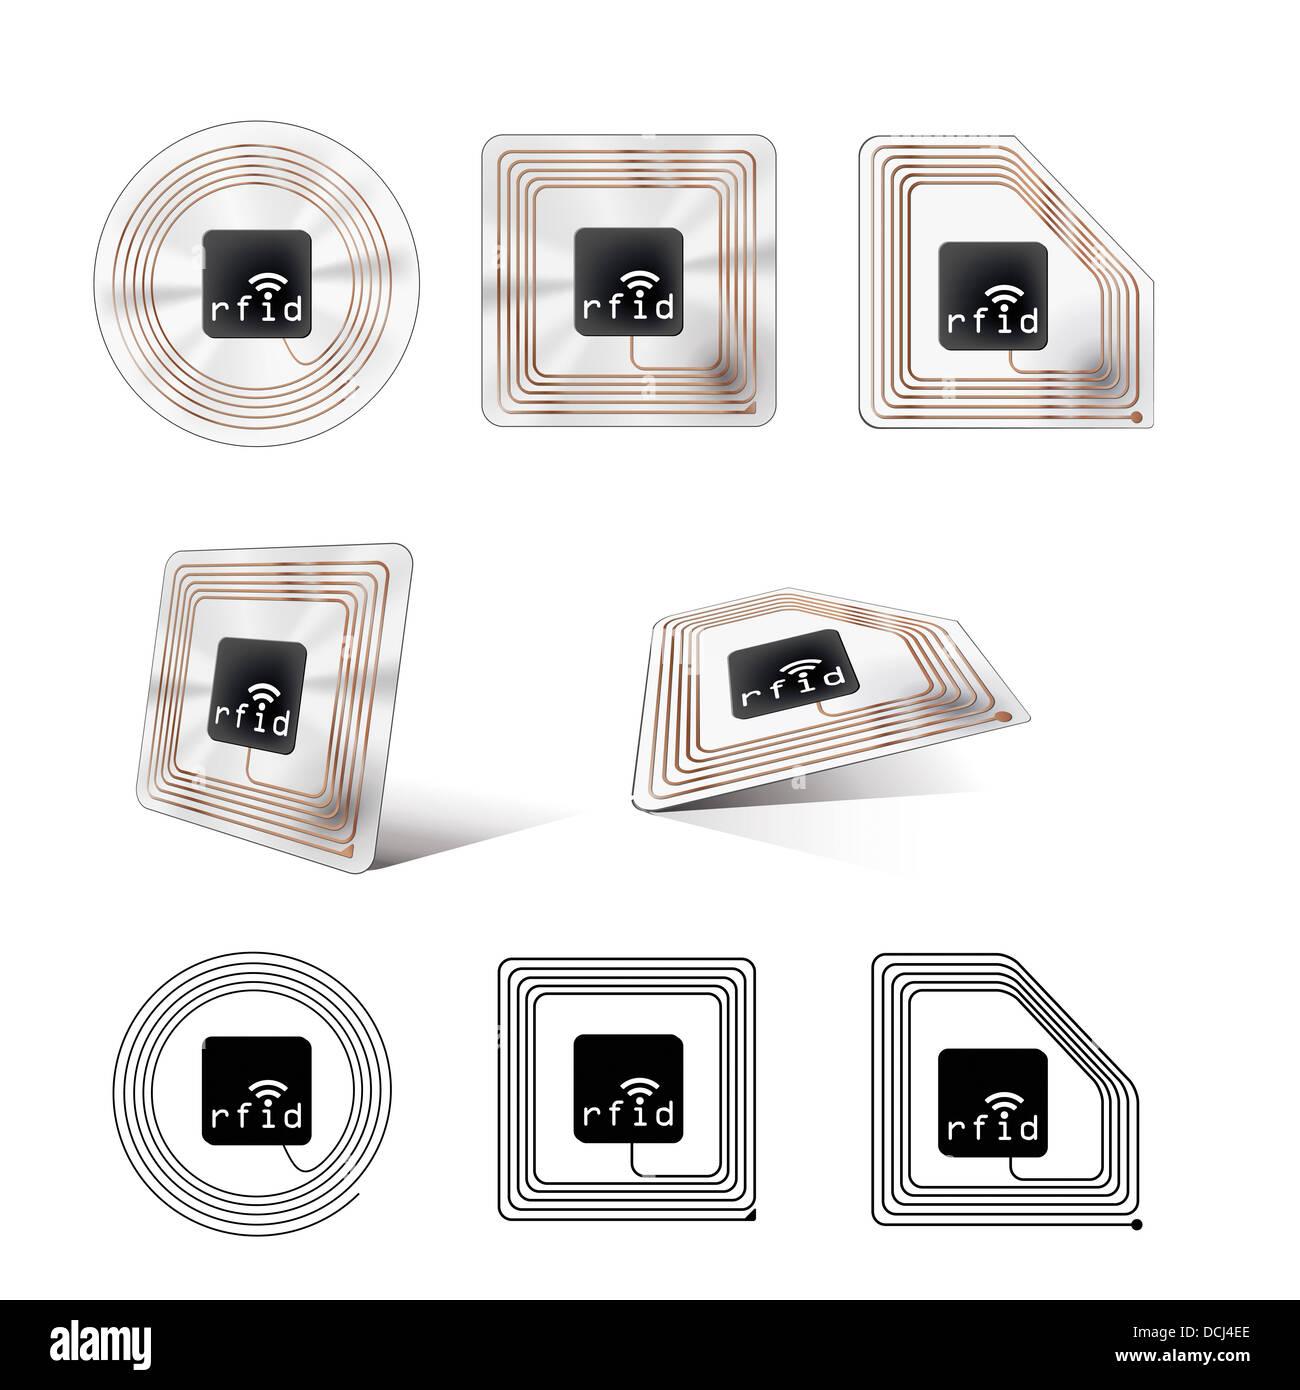 rfid chip stock photo royalty free image 59405654 alamy. Black Bedroom Furniture Sets. Home Design Ideas